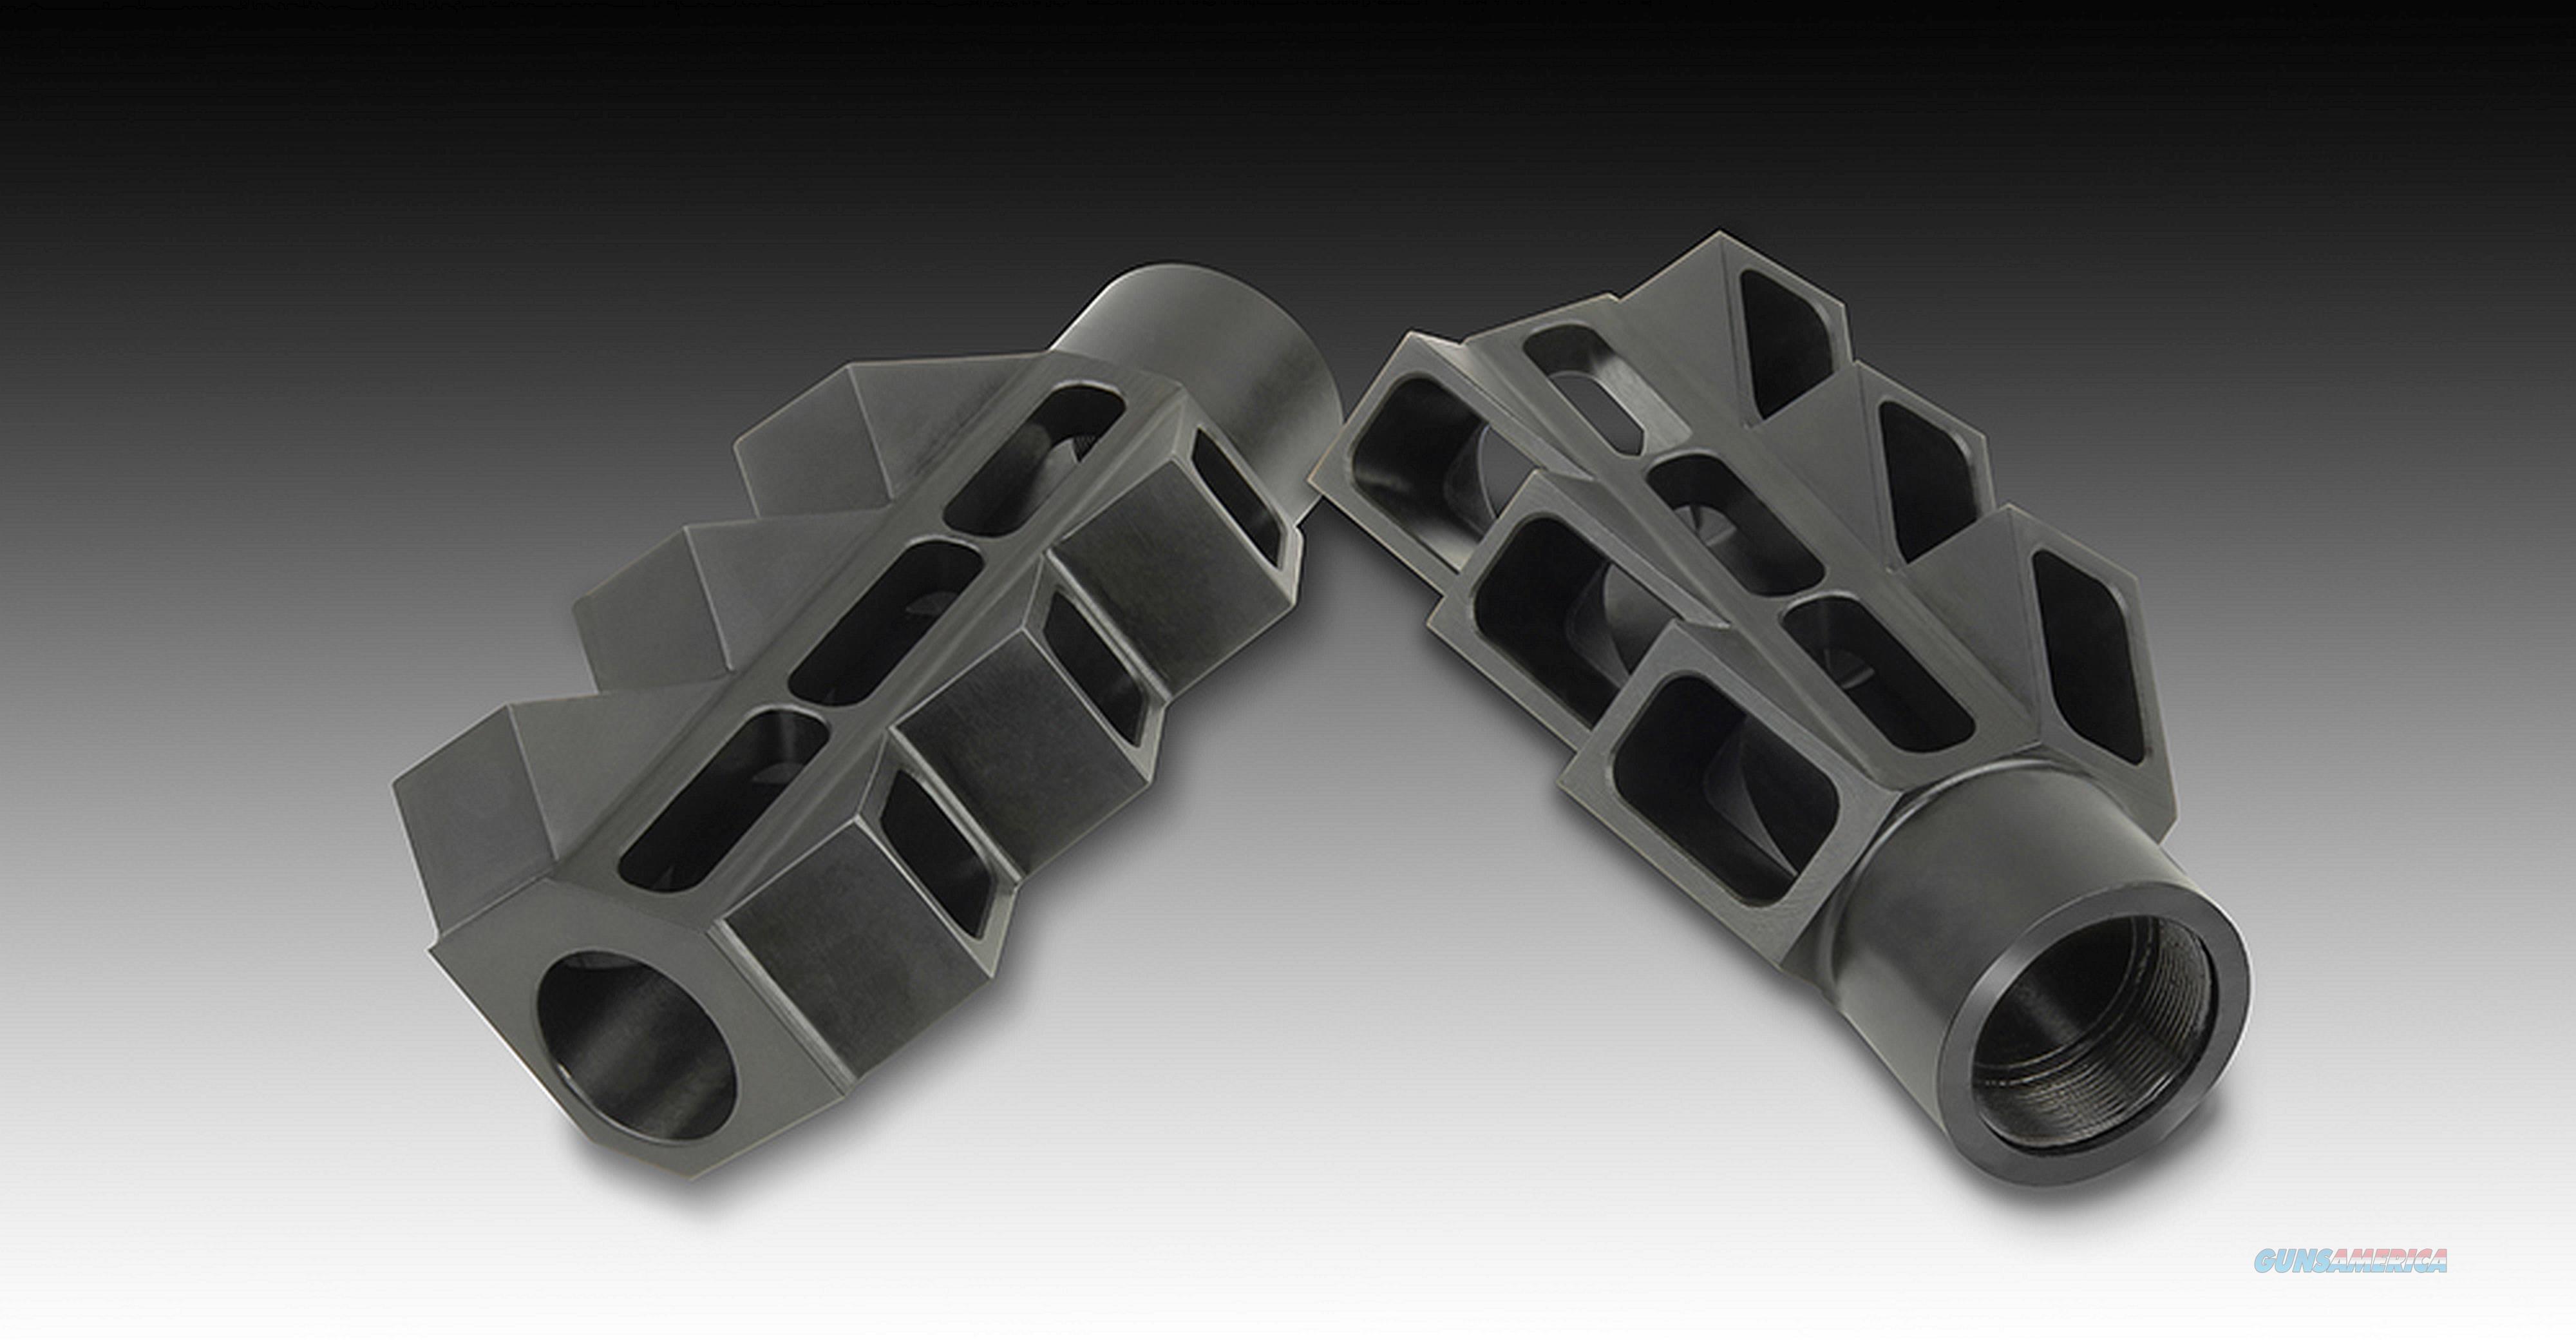 V6 Muzzle Brake for the Saiga 12, KSG, Origin 12, VEPR 12, DDI 12, FURY,  XTR-12